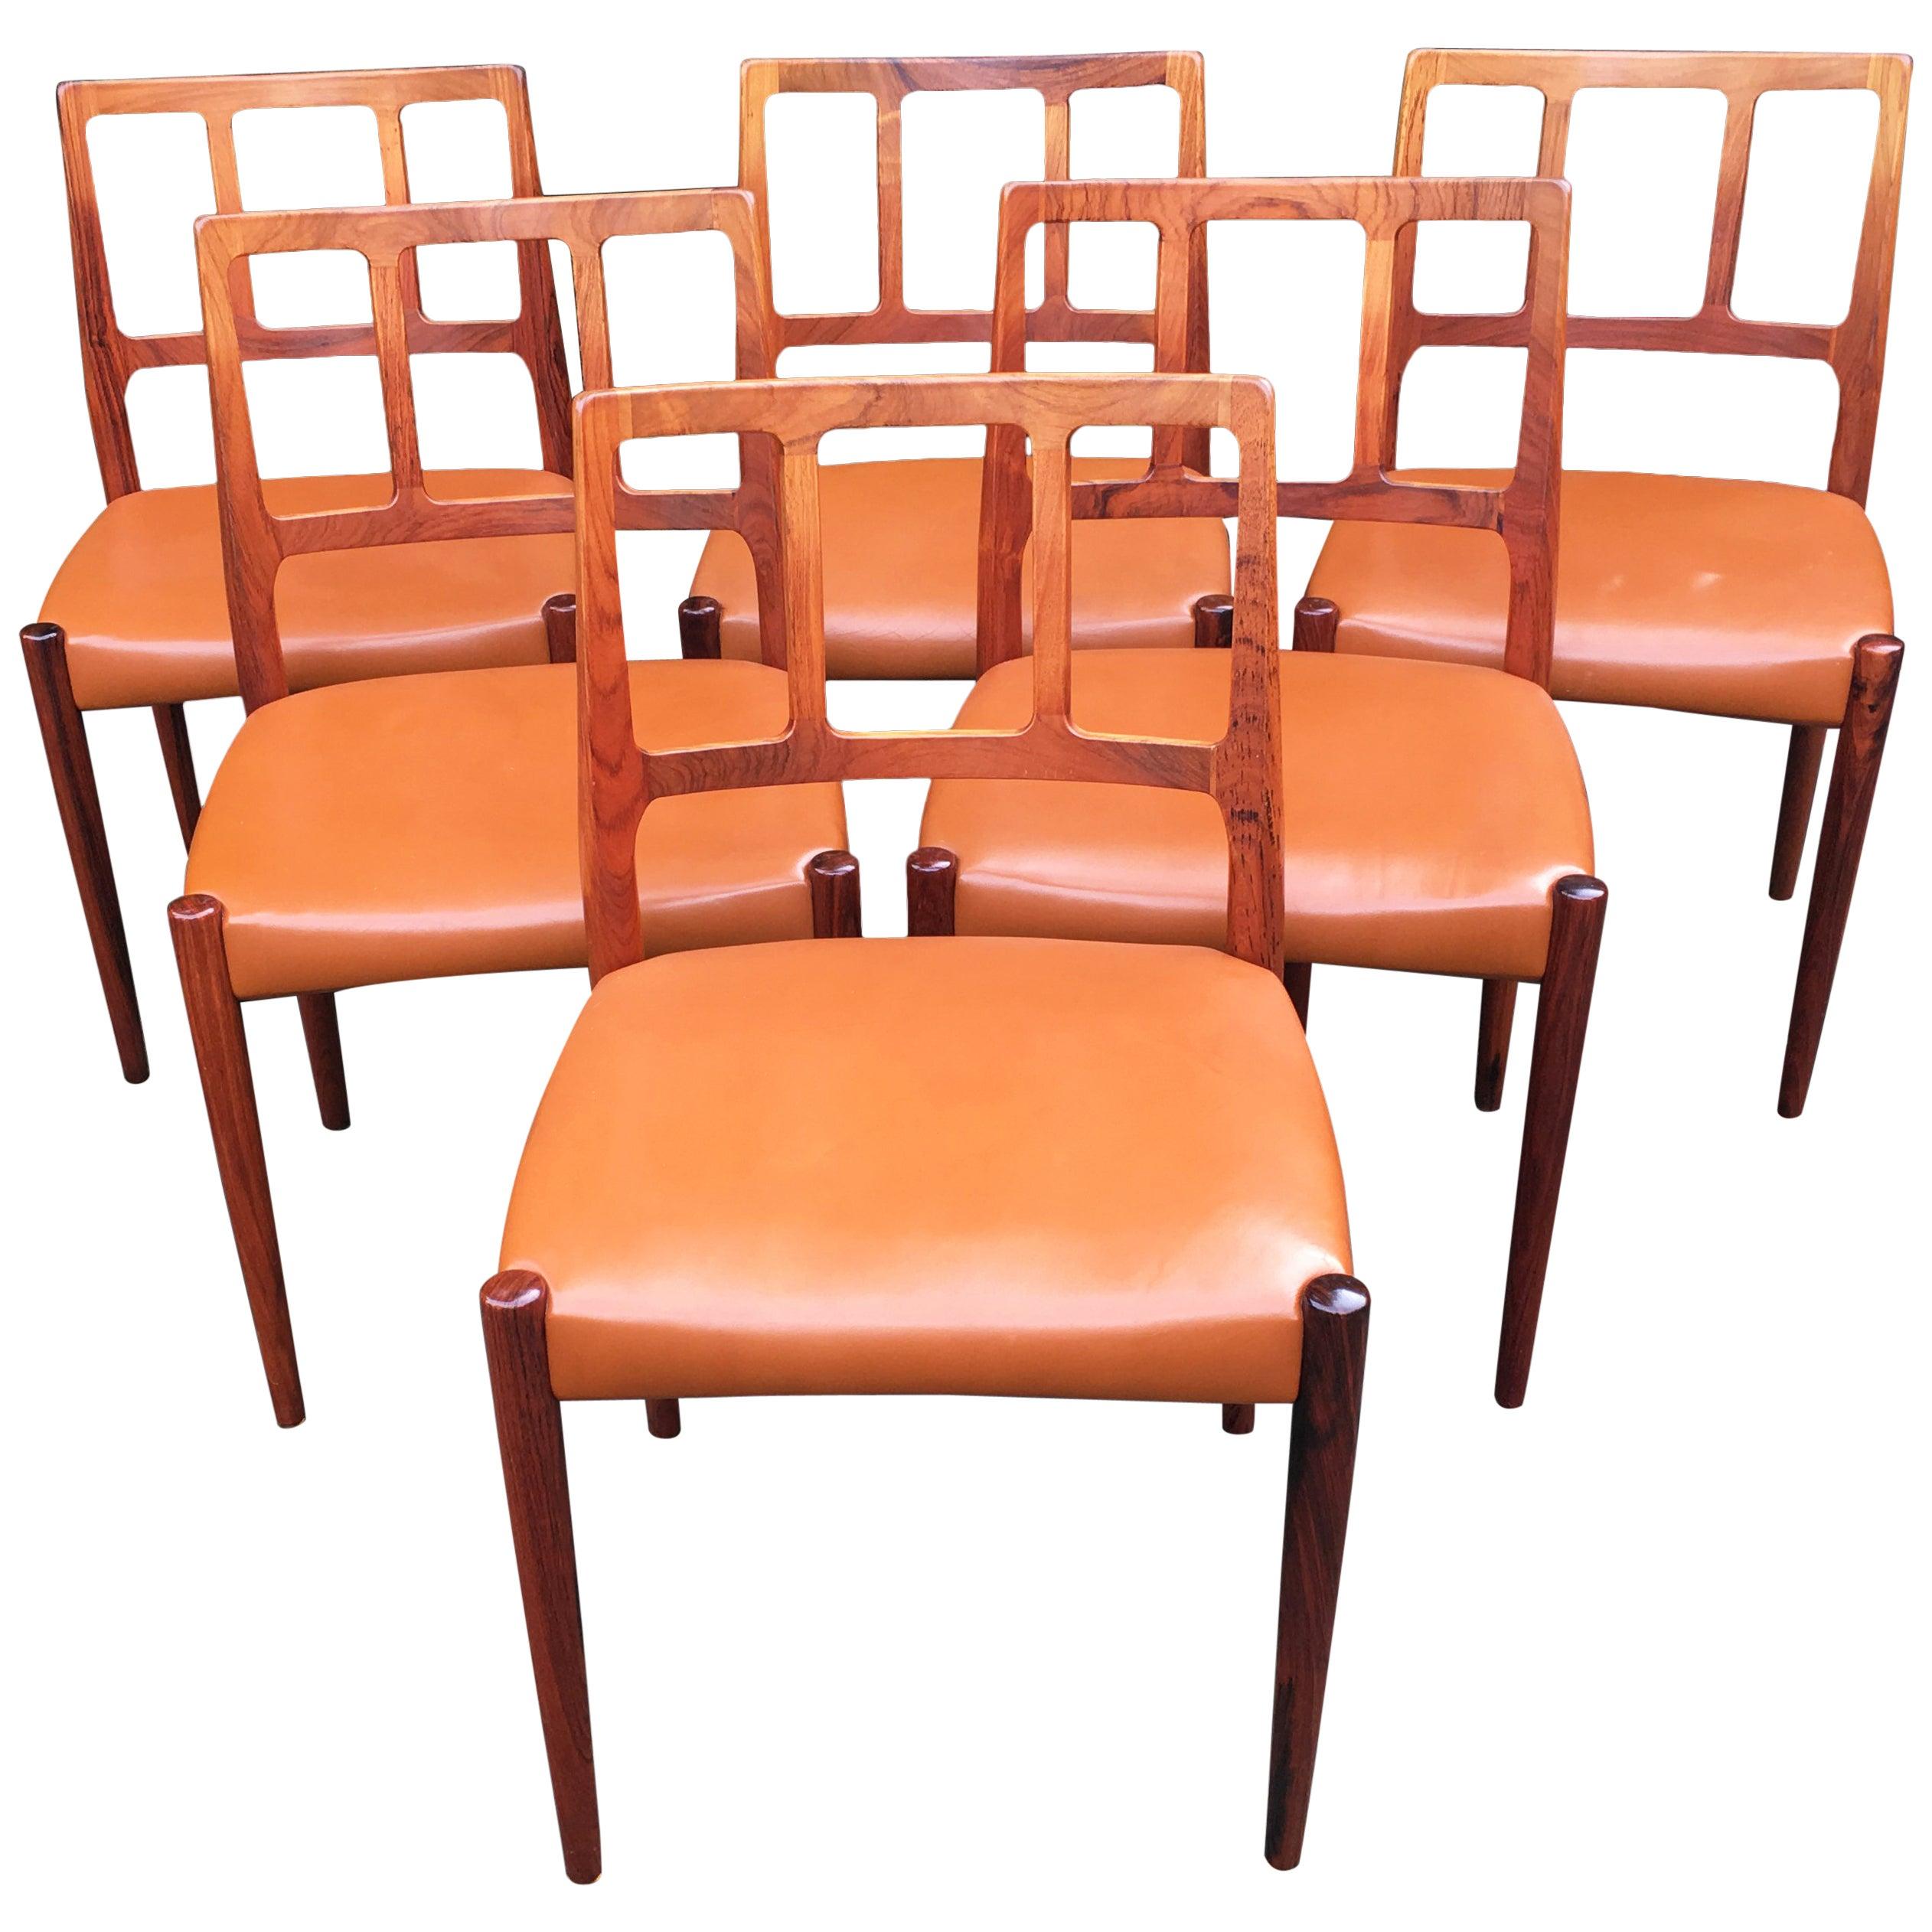 Six Rosewood Dining Chairs by Johannes Andersen for Uldum Møbelfabrik